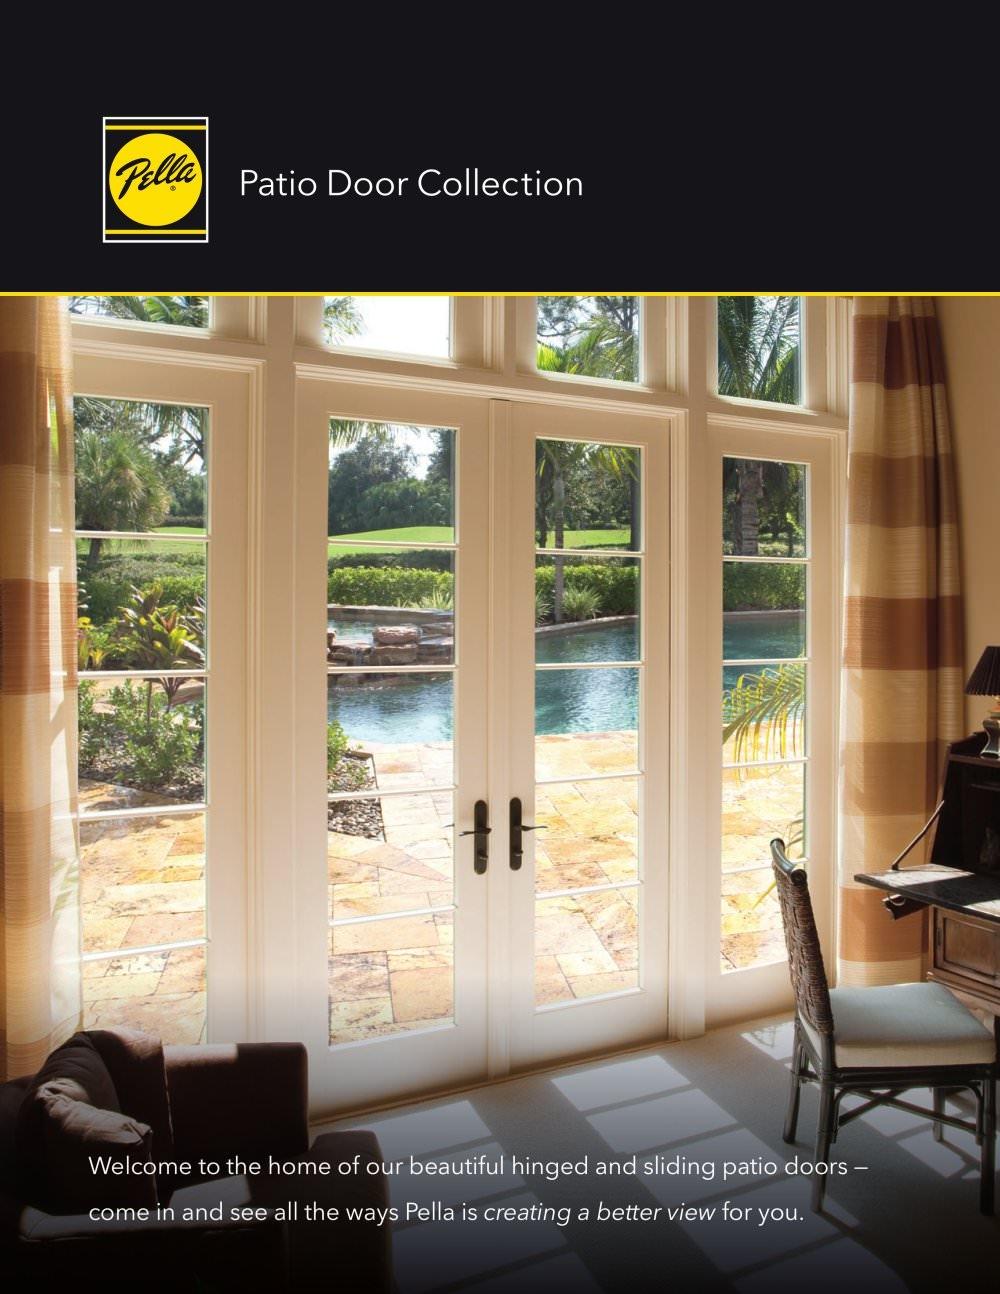 Pella 350 Series 4 Panel Sliding DoorPella 350 Series 4 Panel Sliding Door